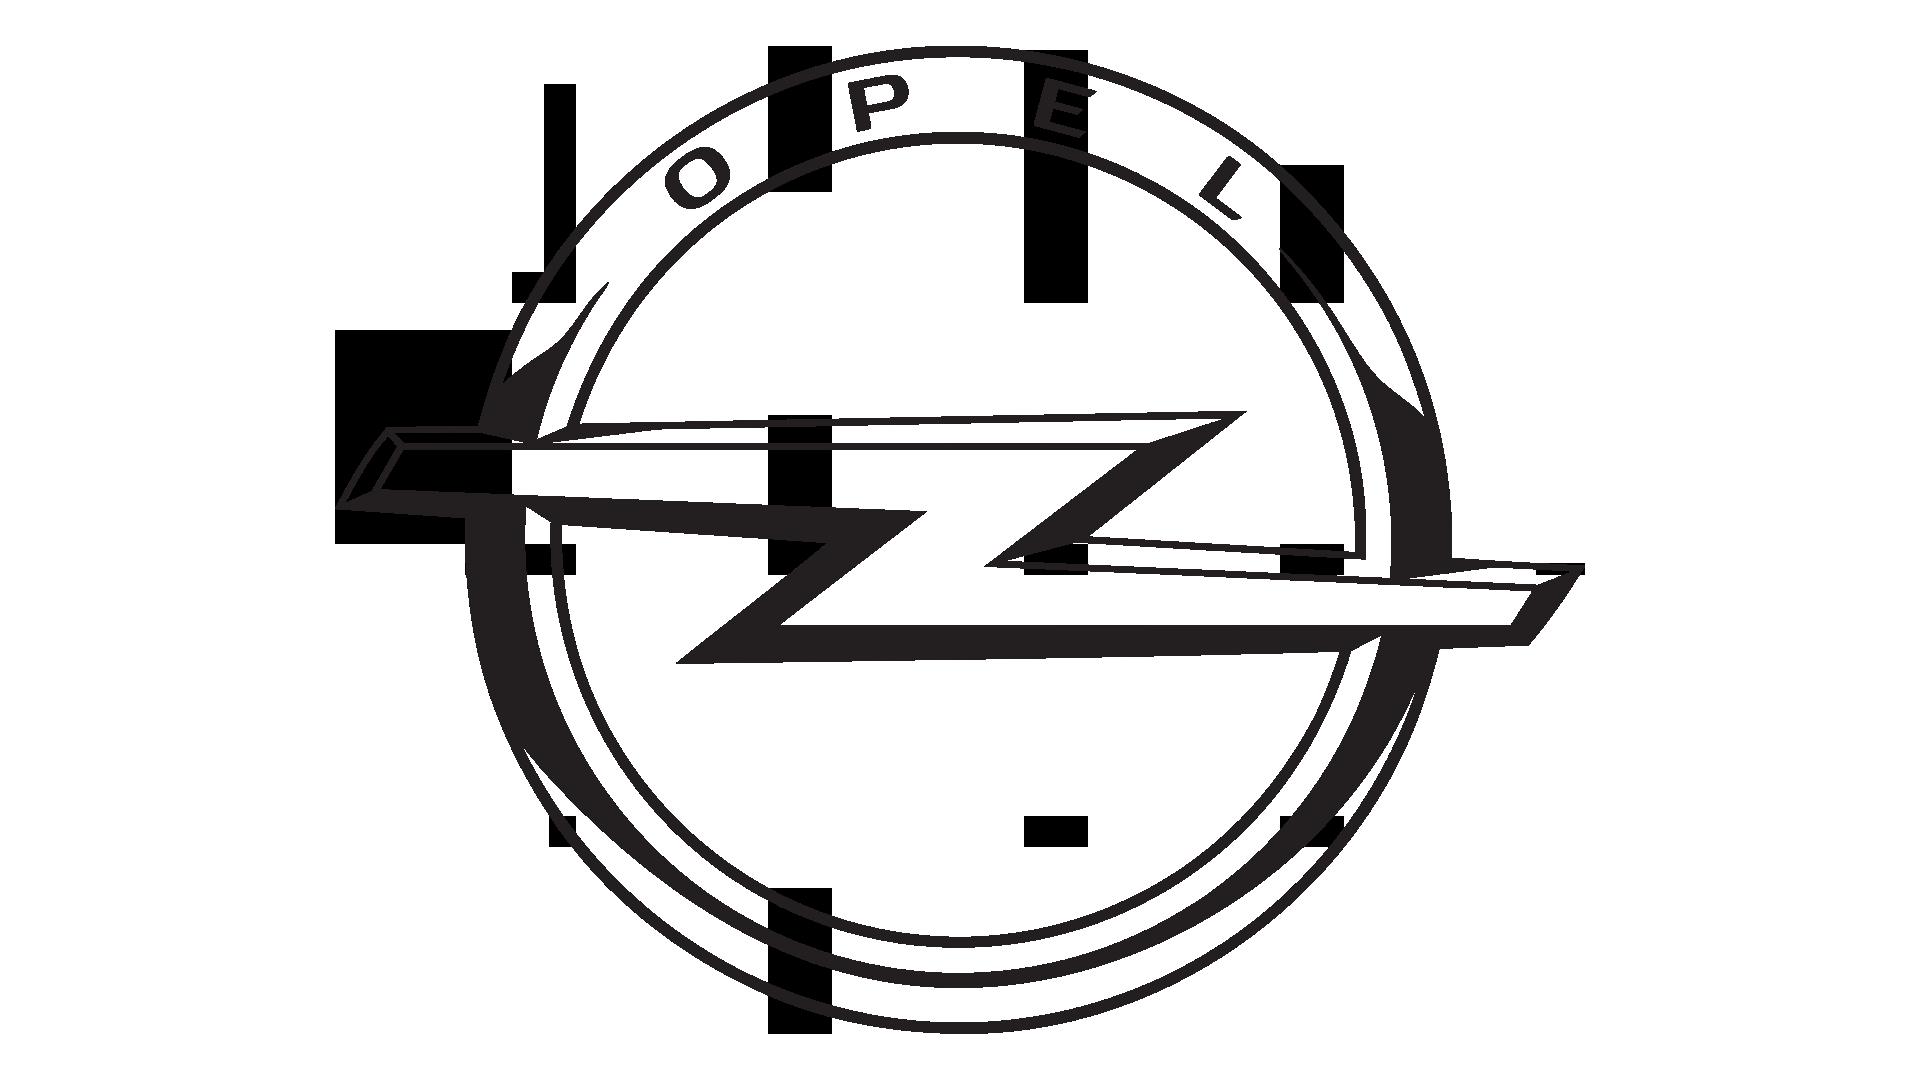 Opel Symbol (2009) 1920x1080 HD png - Opel HD PNG